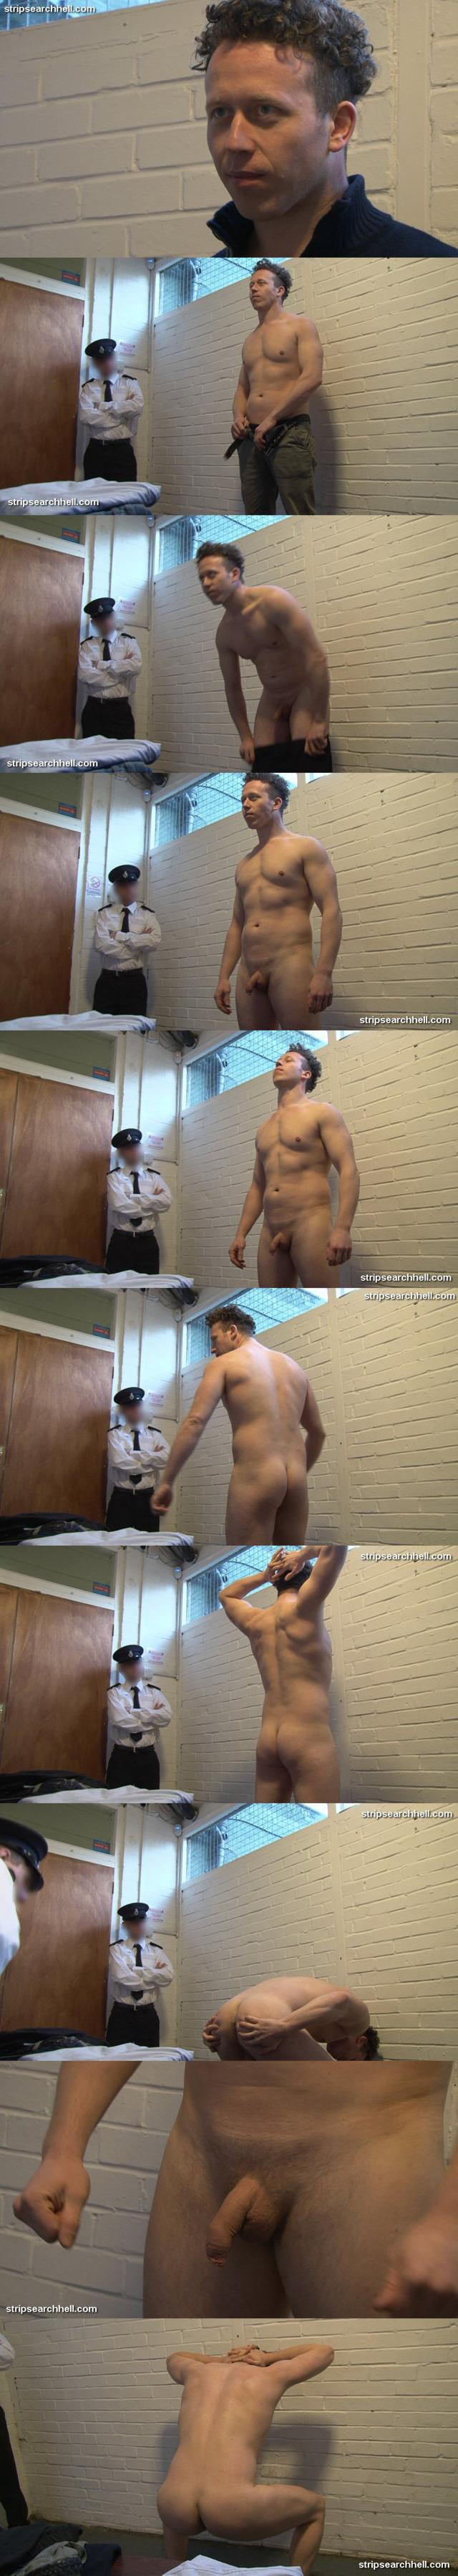 nude pics of shri devi